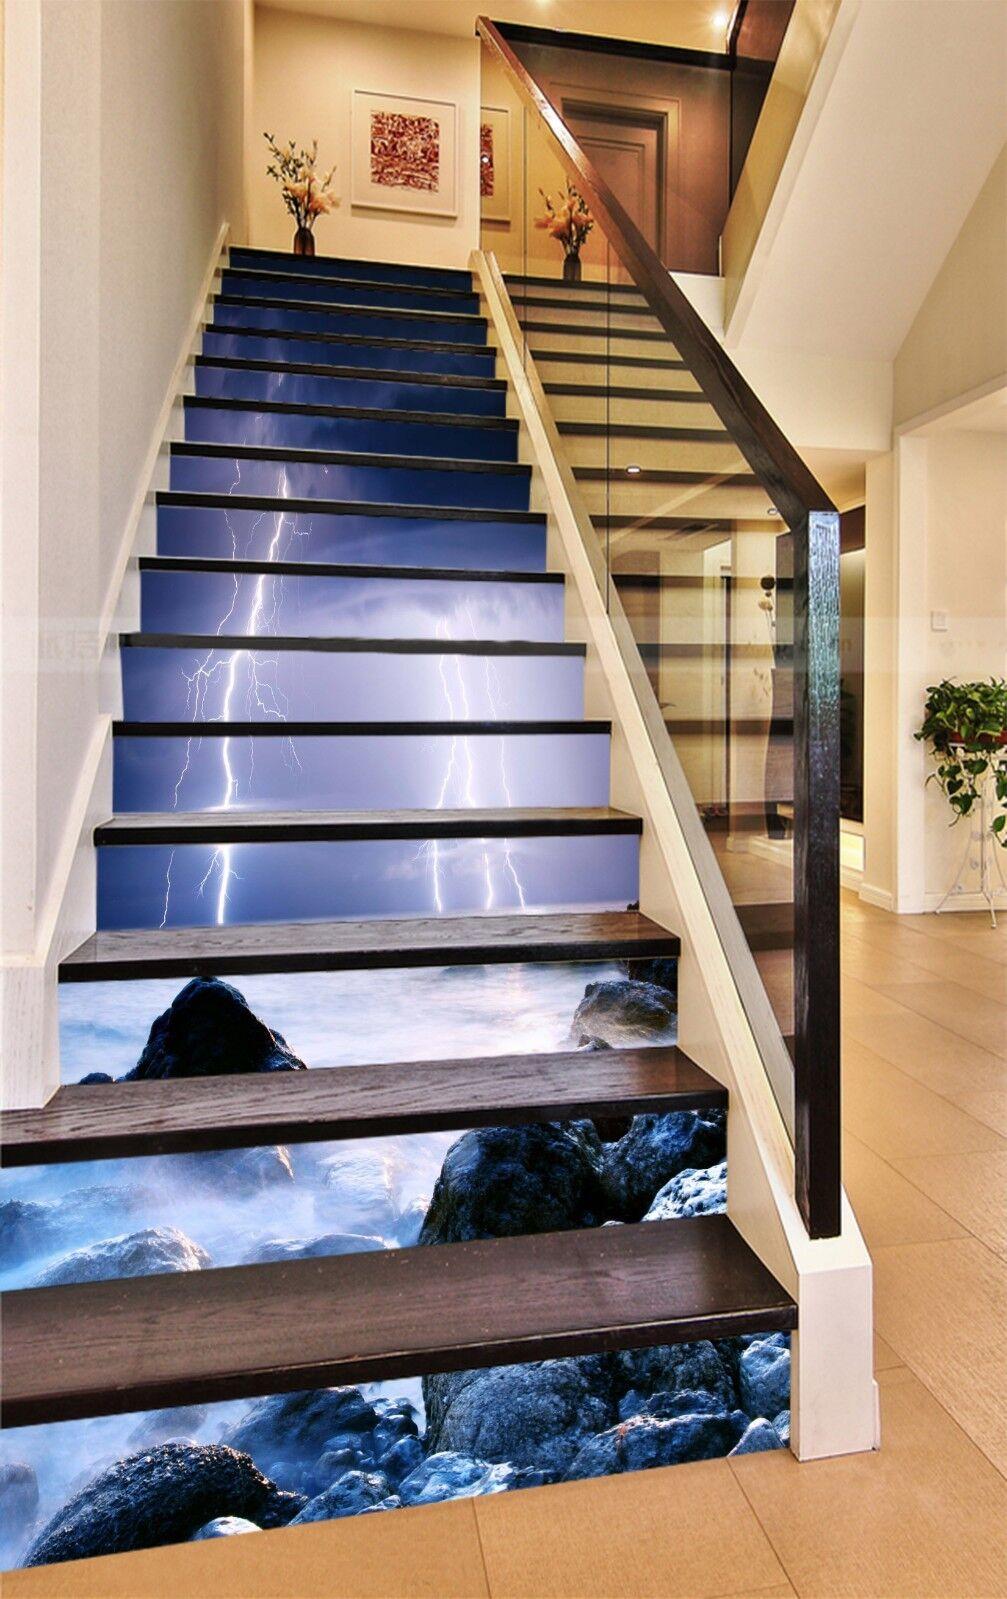 3D Lightning cloud Stair Risers Decoration Photo Mural Vinyl Decal WandPapier AU